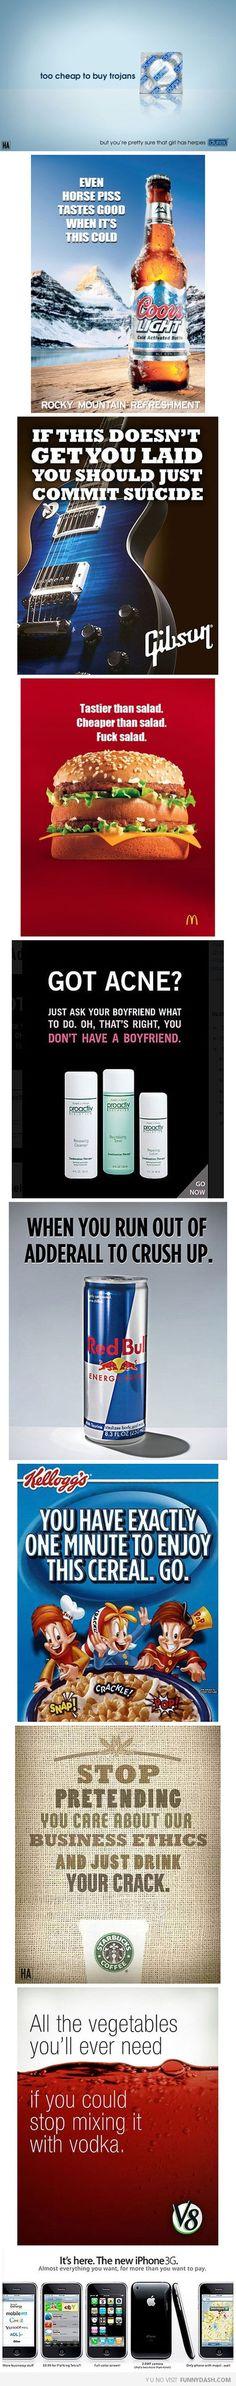 If Advertisements Were Honest